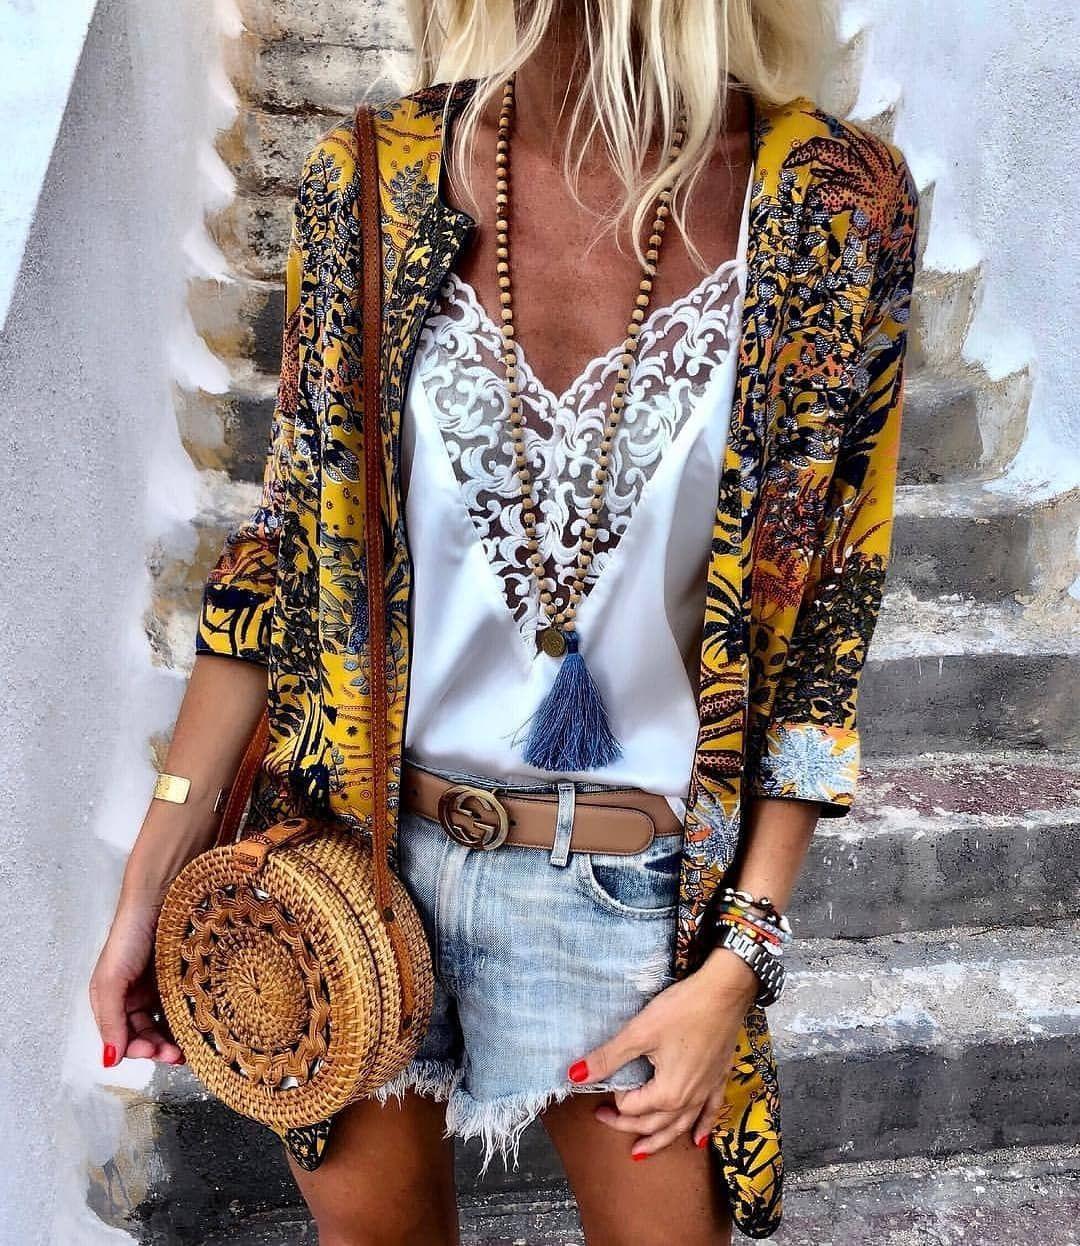 "Fashion Designer on Instagram ""Today outfit ☀☀☀☀☀☀ Via @annamavridis   Anzeige                                                                  boho bohostyle…"" is part of Boho chic outfits - 2,893 Likes, 55 Comments  Fashion Designer (@free spirit loveee) on Instagram ""Today outfit ☀☀☀☀☀☀ Via @annamavridis   Anzeige                                                   …"""